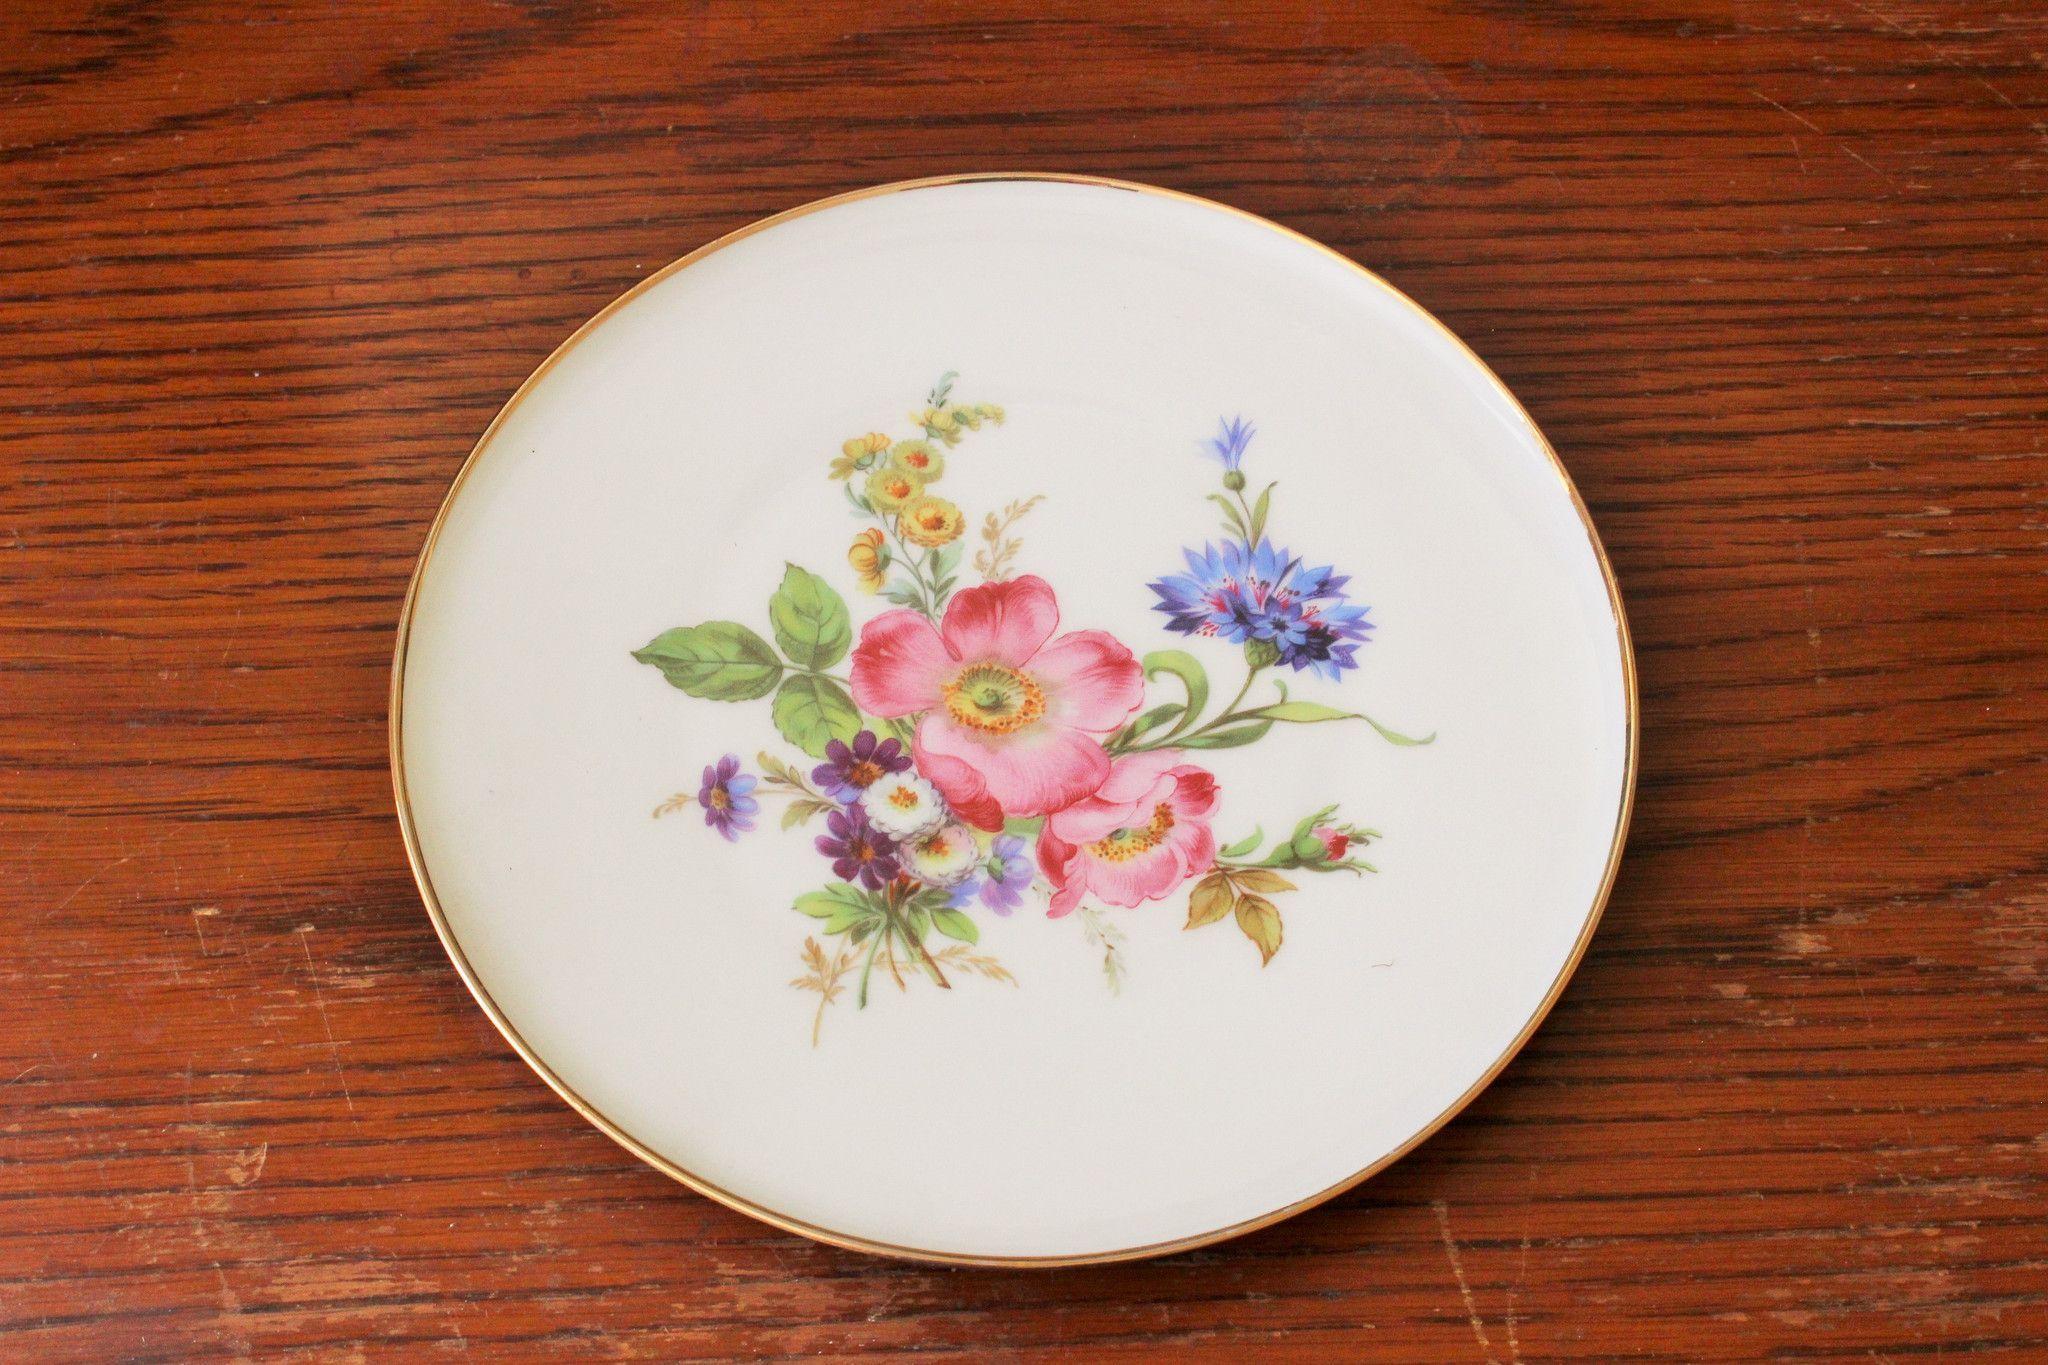 Vintage China Plate J K Decor Carlsbad Bavaria Toadstool Farm